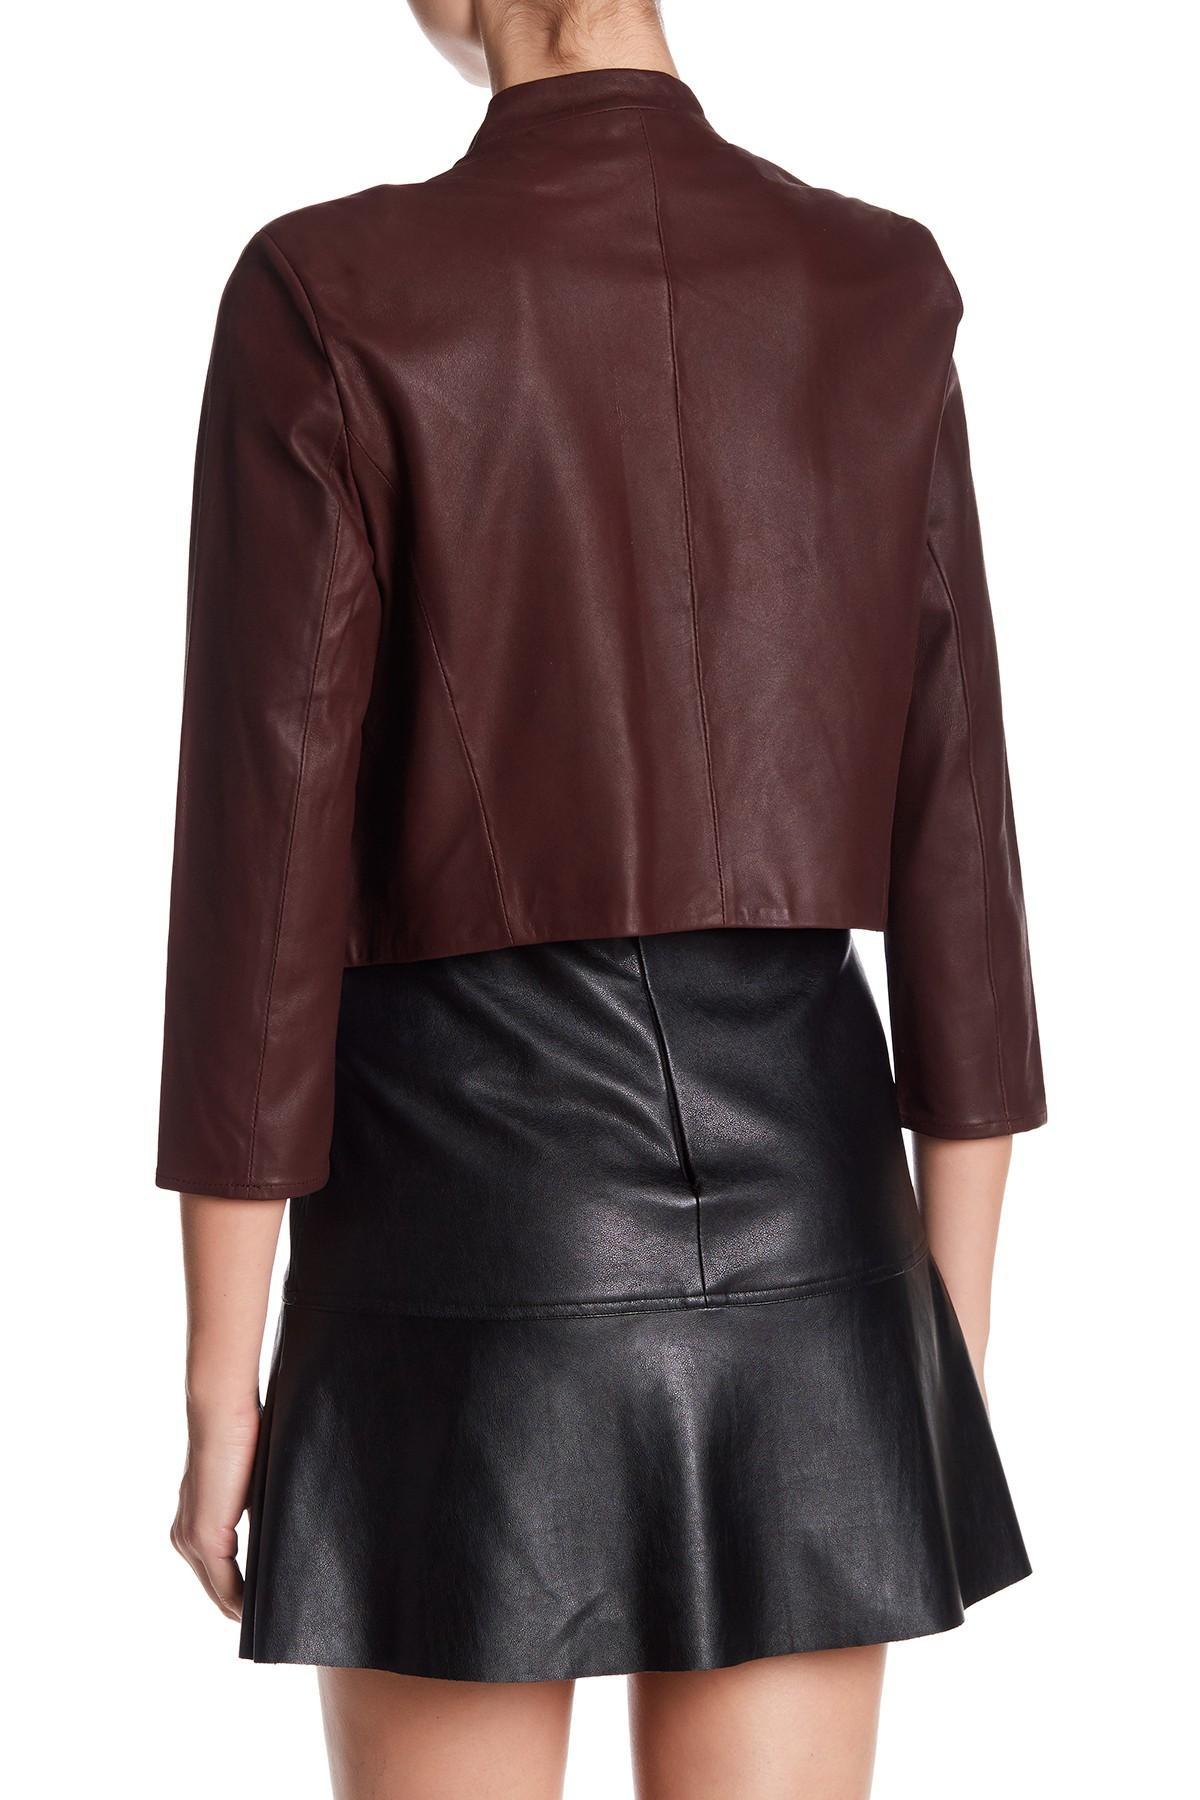 3 4 sleeve leather jacket